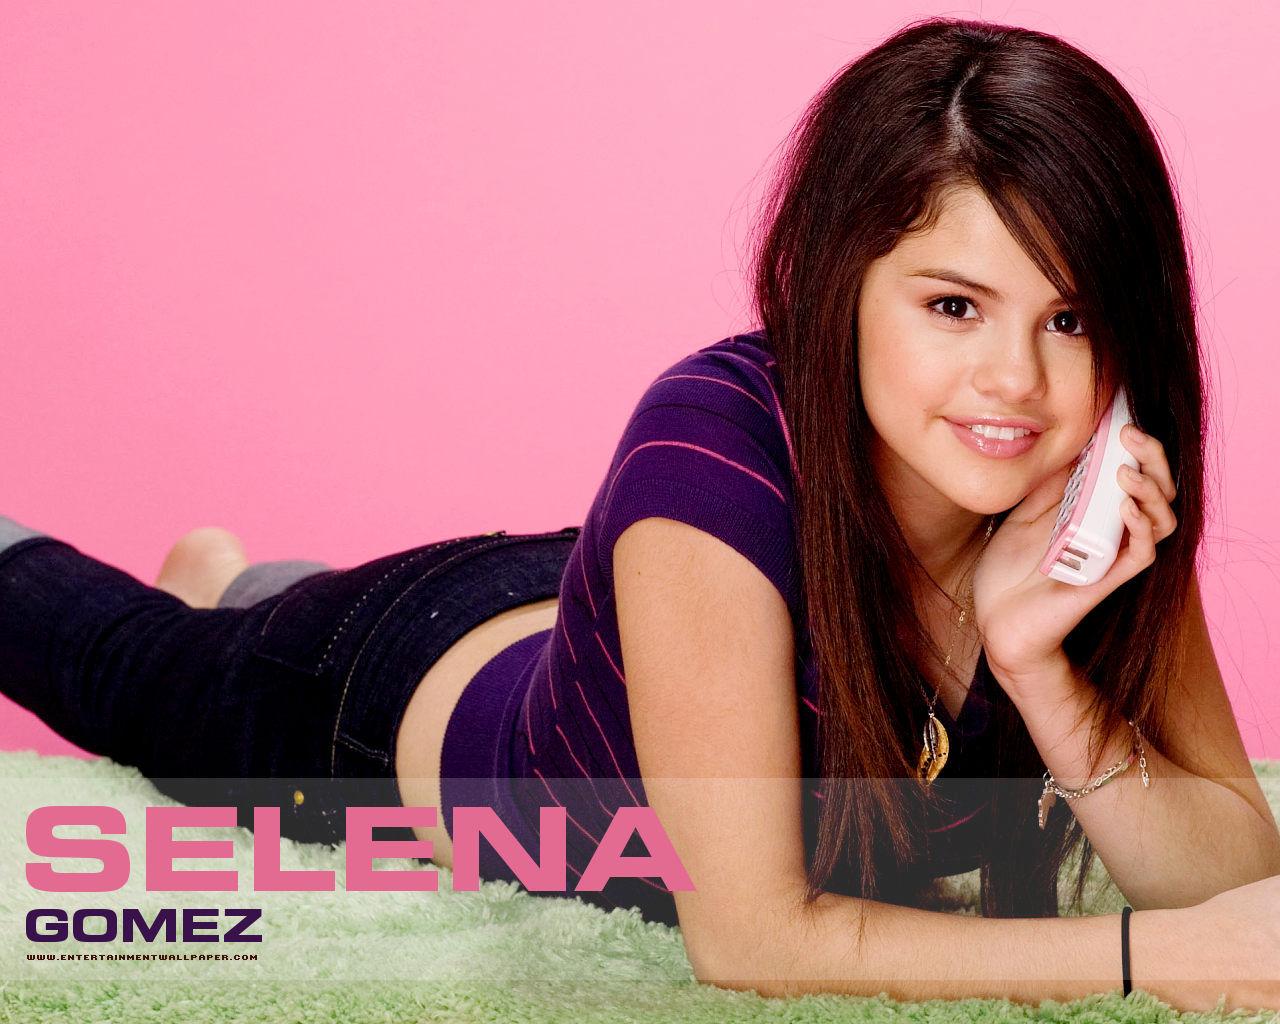 http://4.bp.blogspot.com/-tGslkK8TJfM/TqwAEXI89MI/AAAAAAAAASY/yWyO3dpHxgc/s1600/Selena%2BGomez%2BStyle%2BWallpaper.jpg